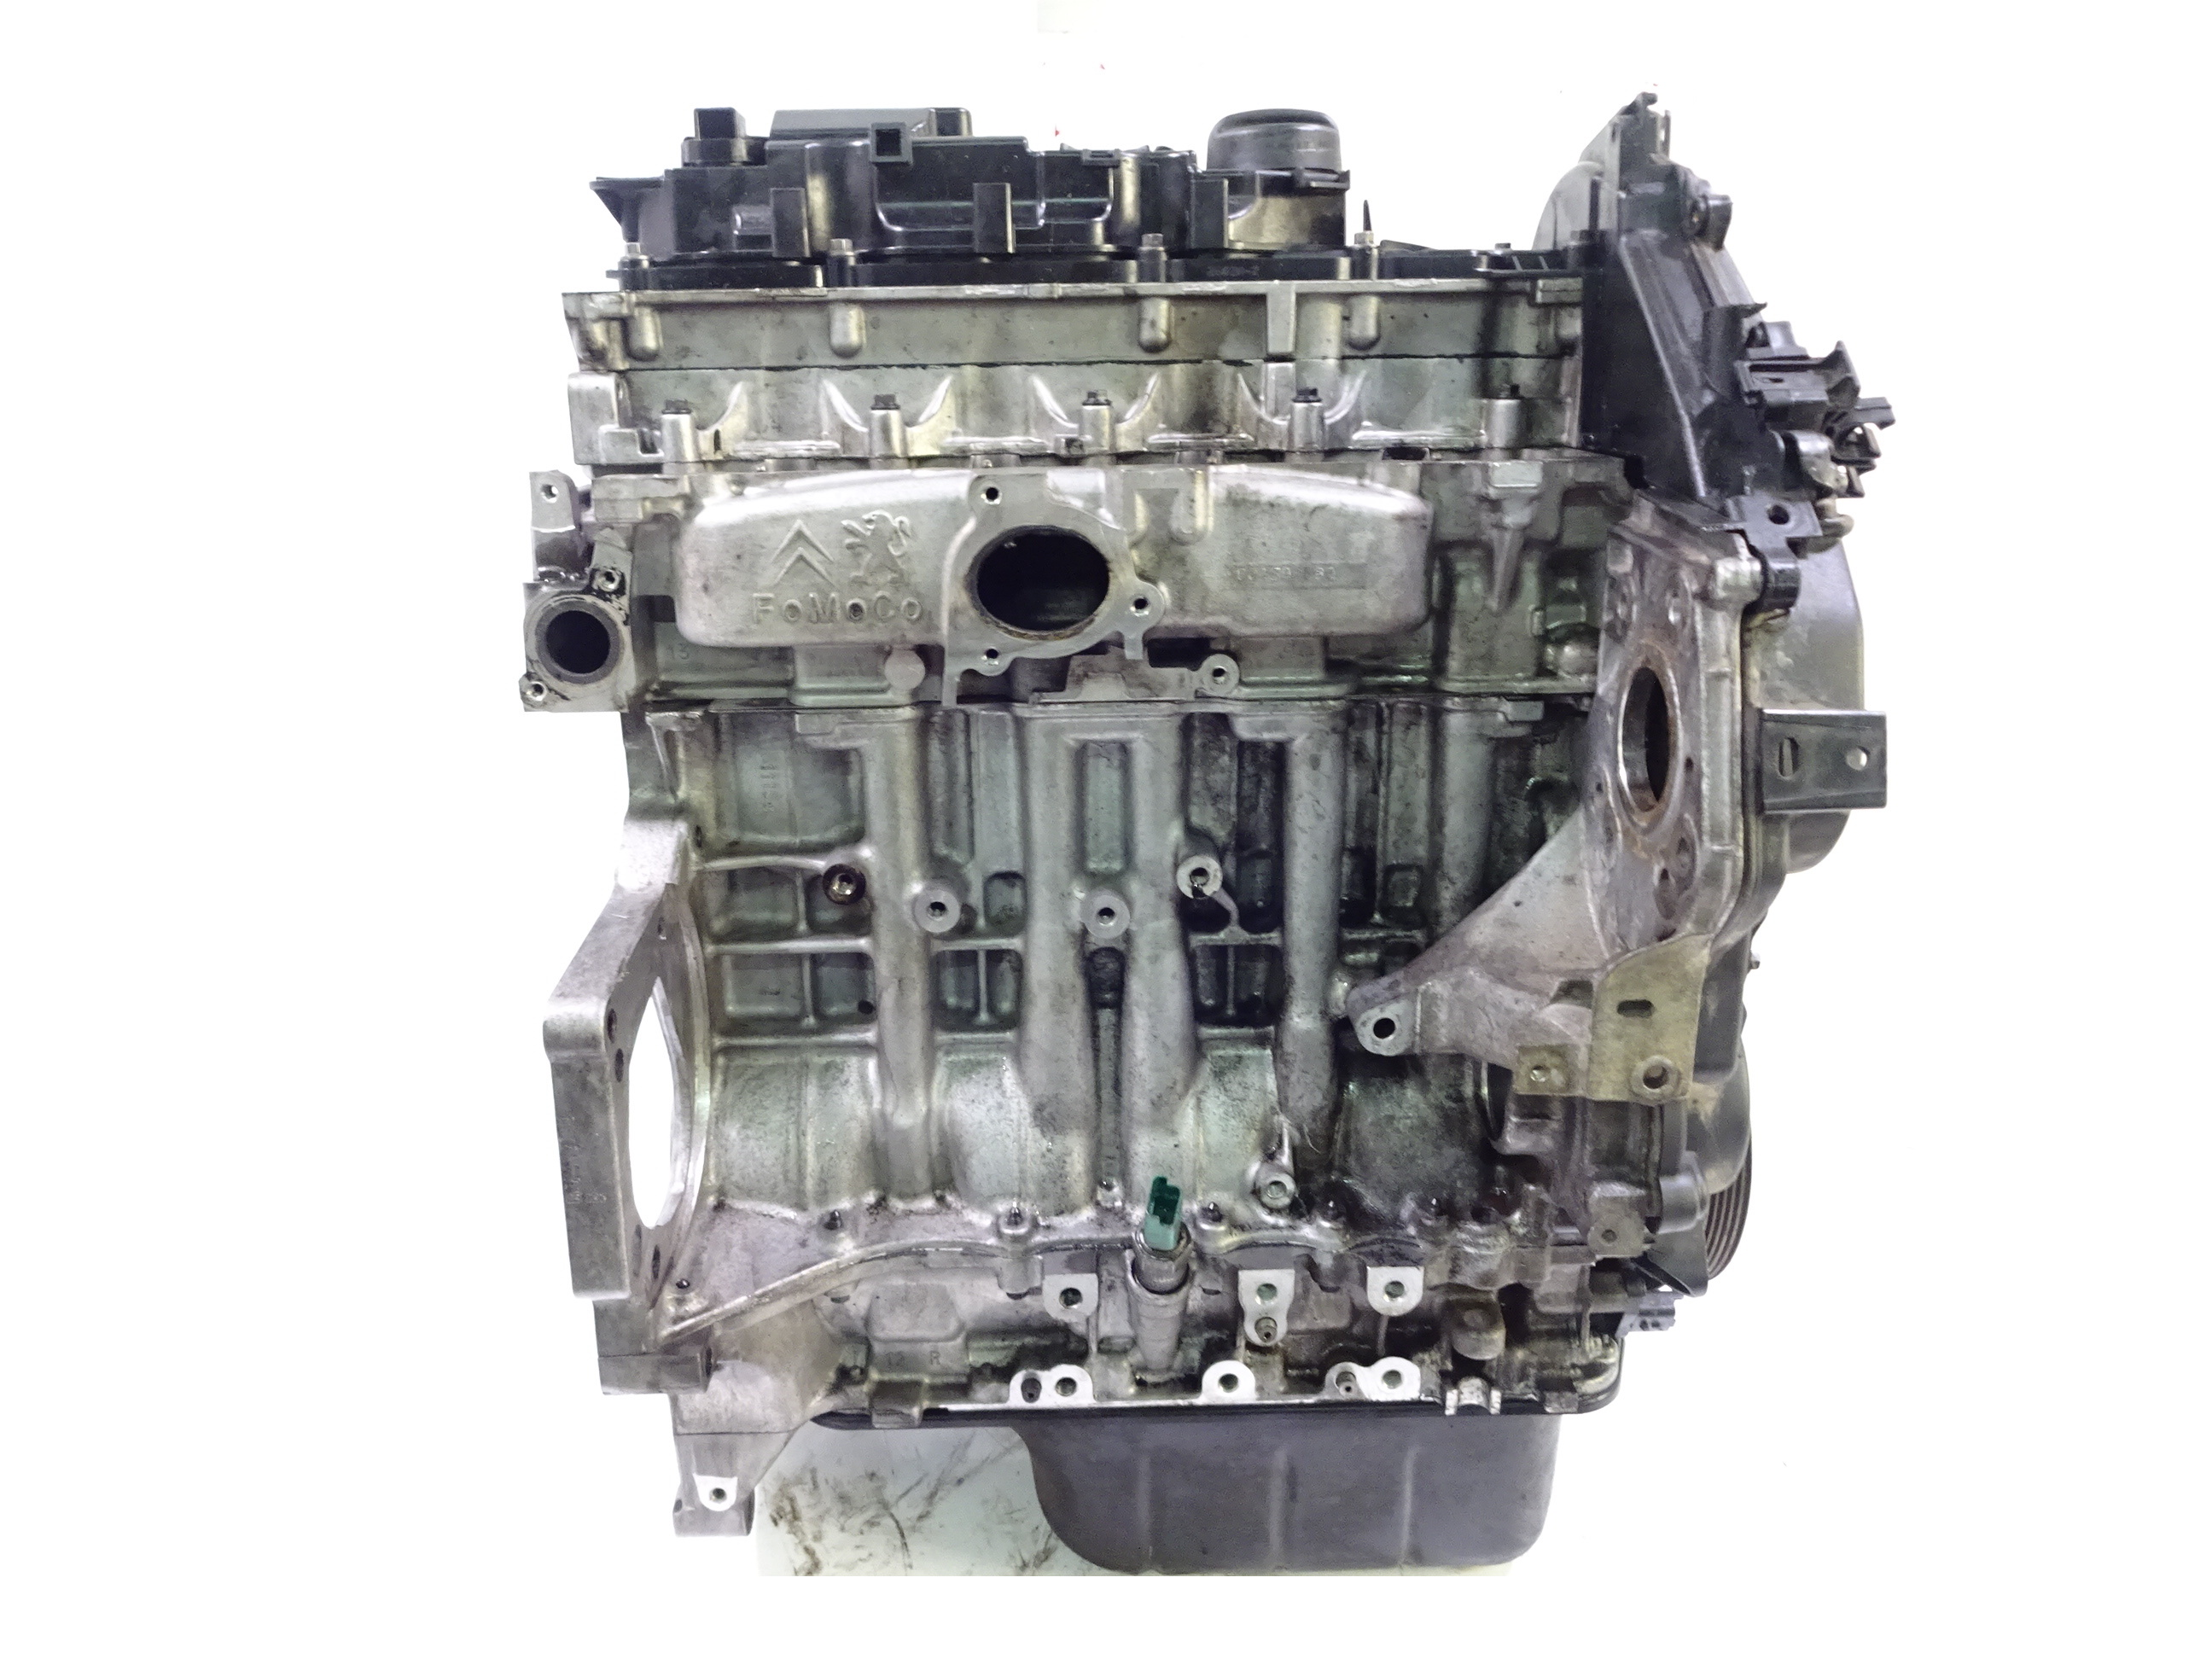 Motor 2013 Citroen C4 Picasso 1,6 HDi Diesel 110 9HR DV6C 9H05